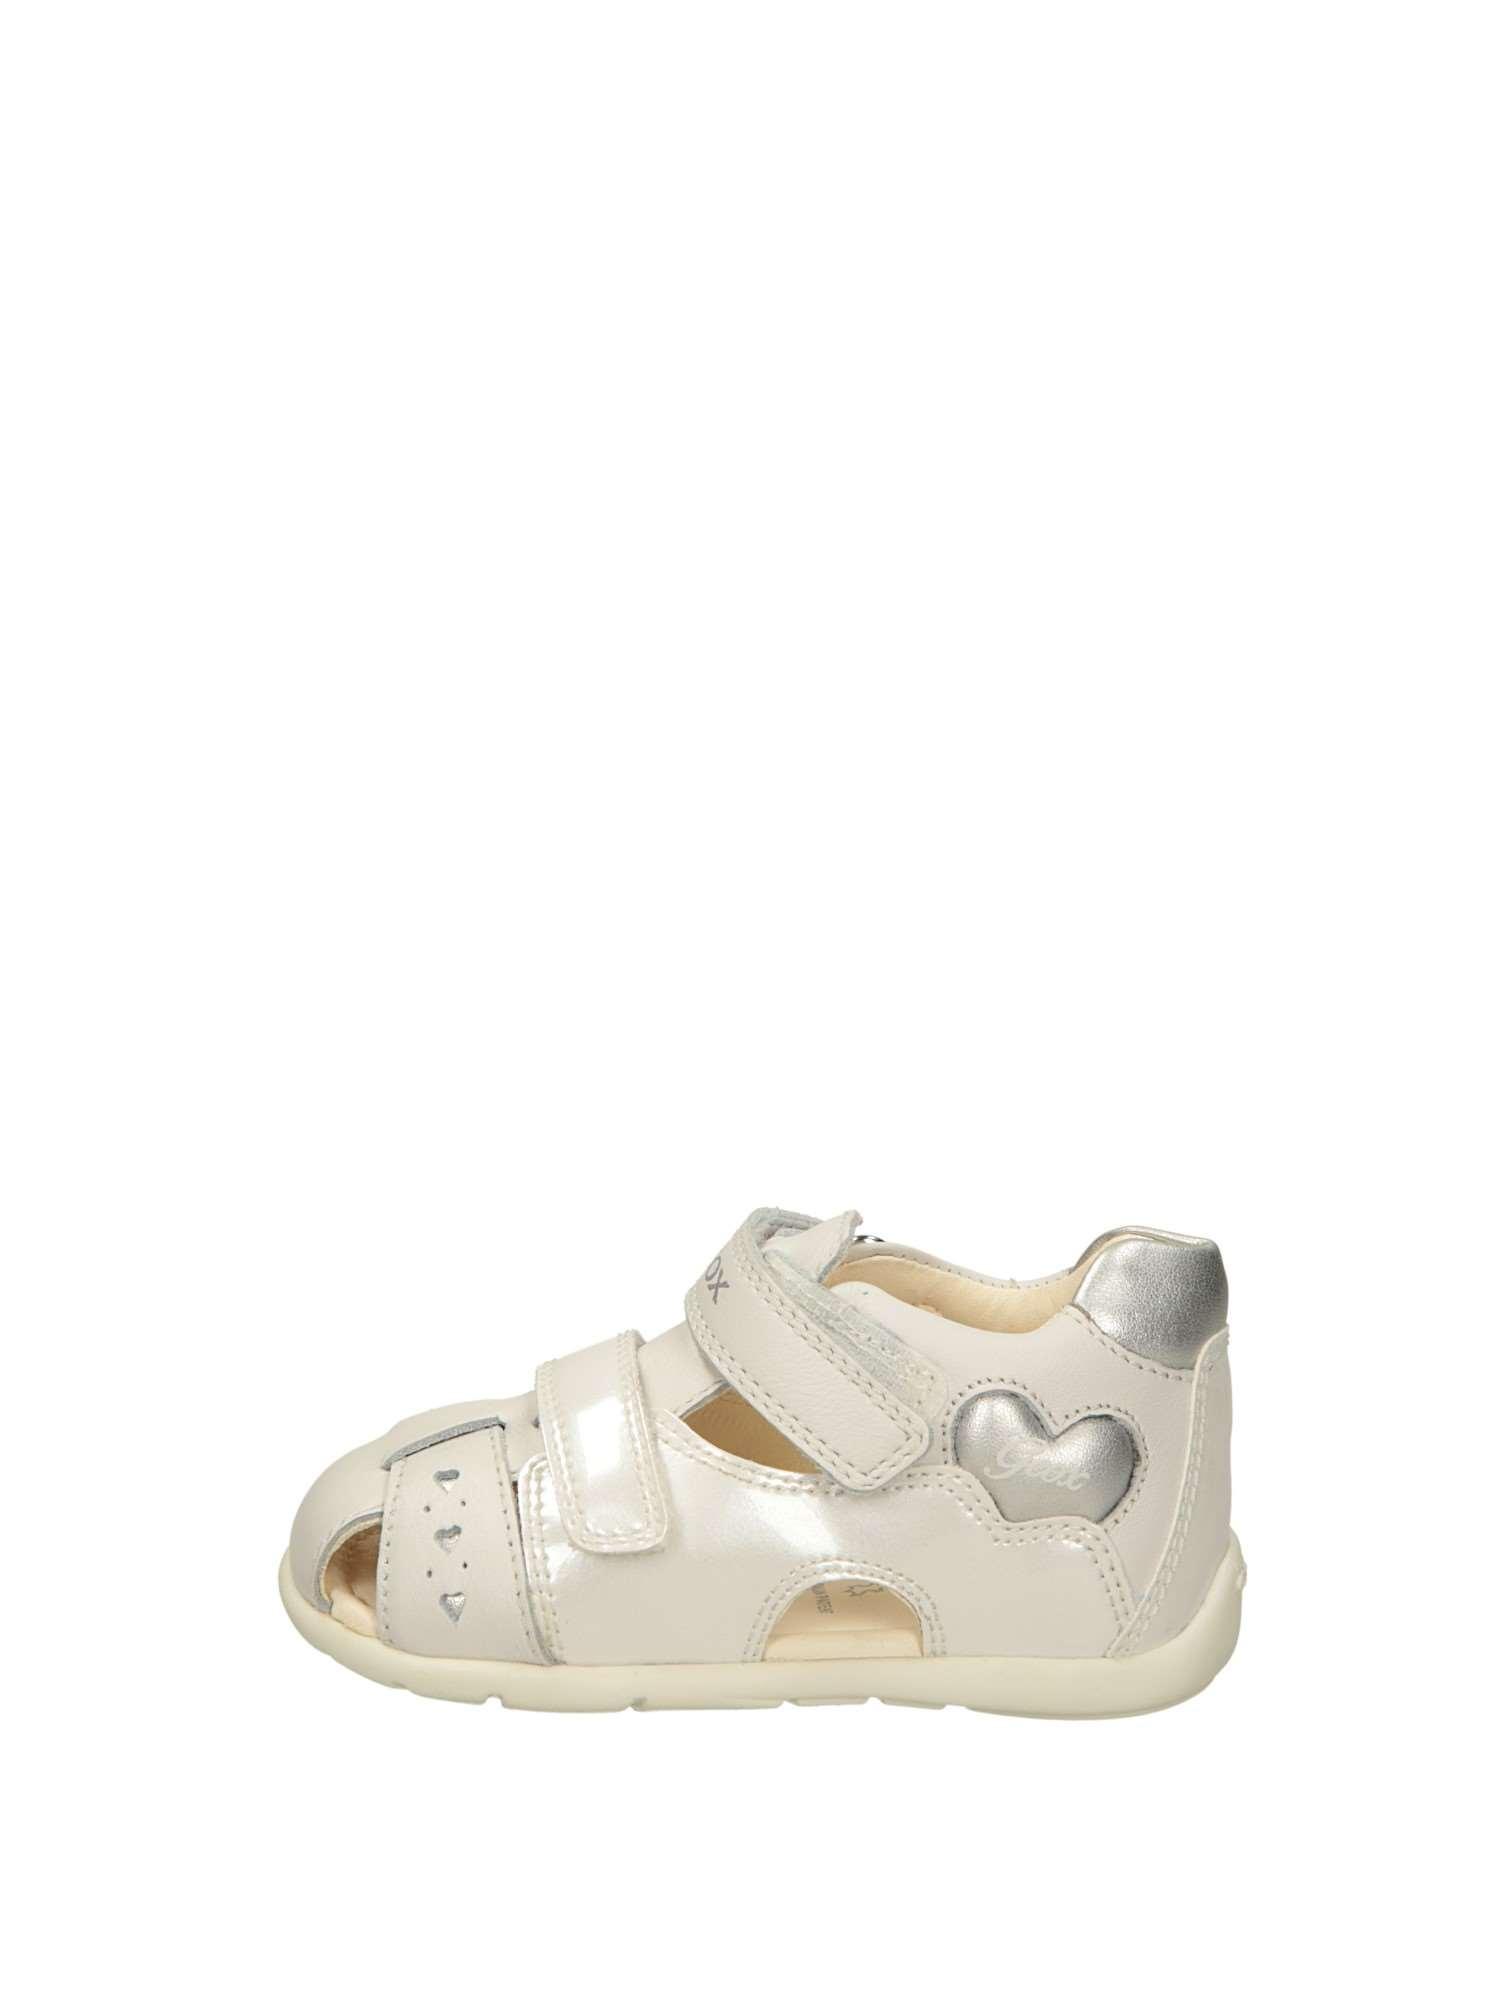 Geox Semi Aperta Bambina Bianco Argento | Lalilina